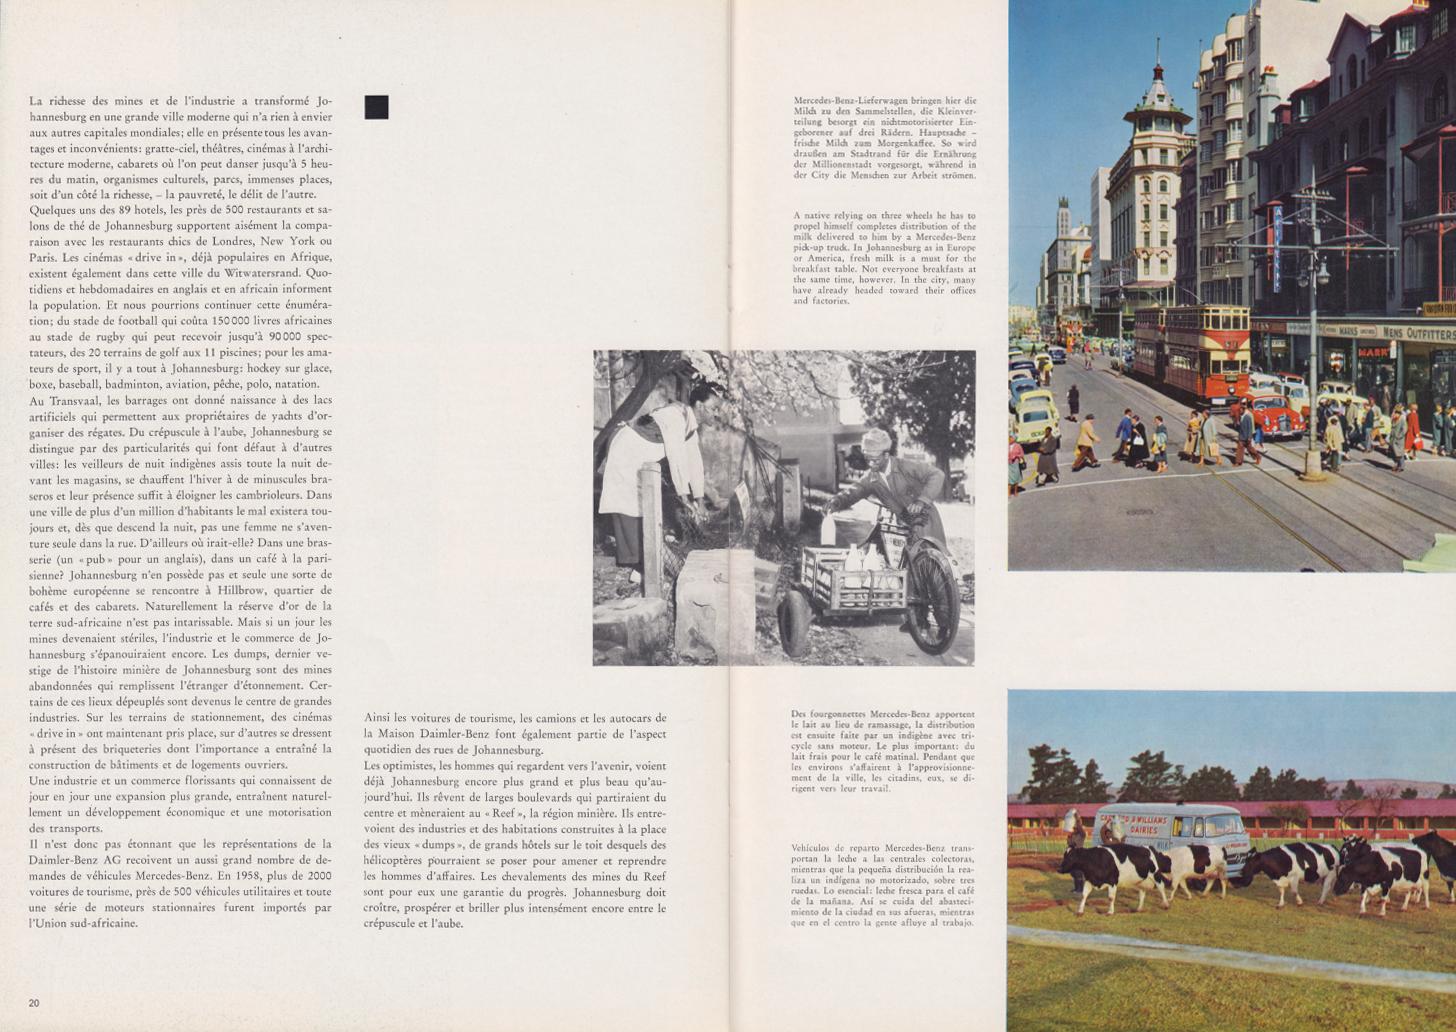 (REVISTA): Periódico In aller welt n.º 34 - Mercedes-Benz no mundo - 1959 - multilingue 011